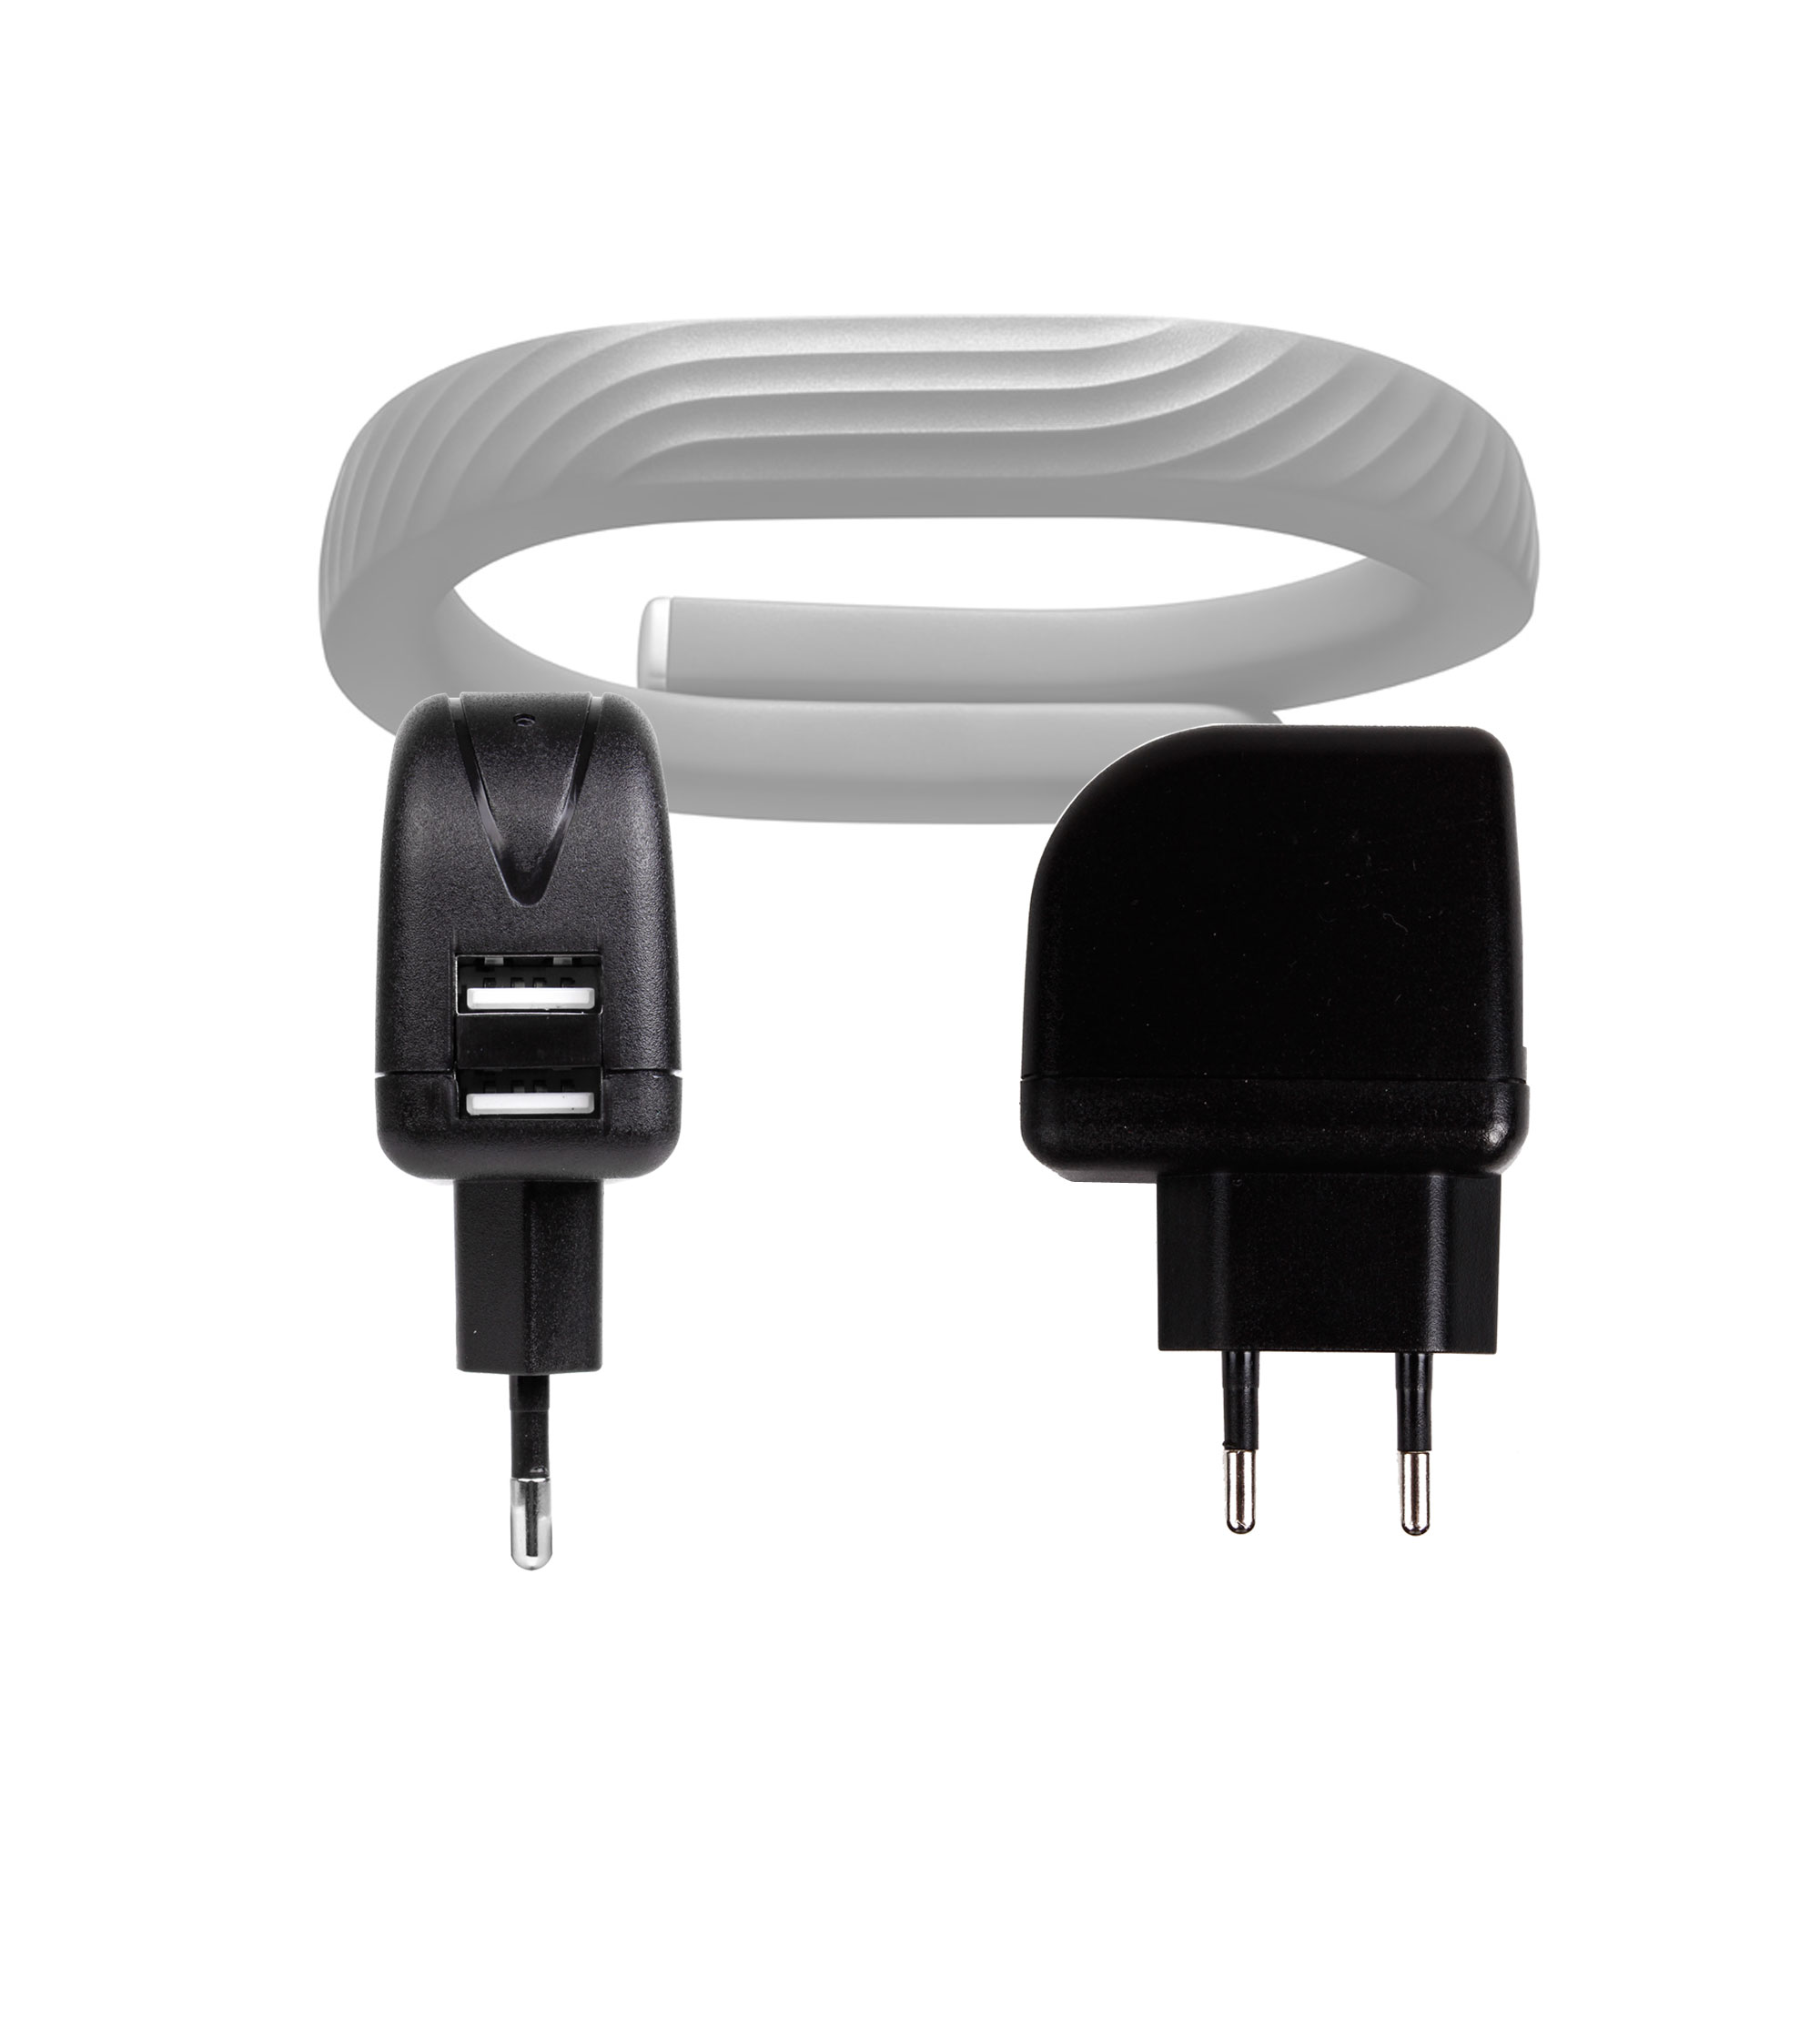 chargeur secteur pour montre connect e tomtom runner cardio multi sport cardio ebay. Black Bedroom Furniture Sets. Home Design Ideas